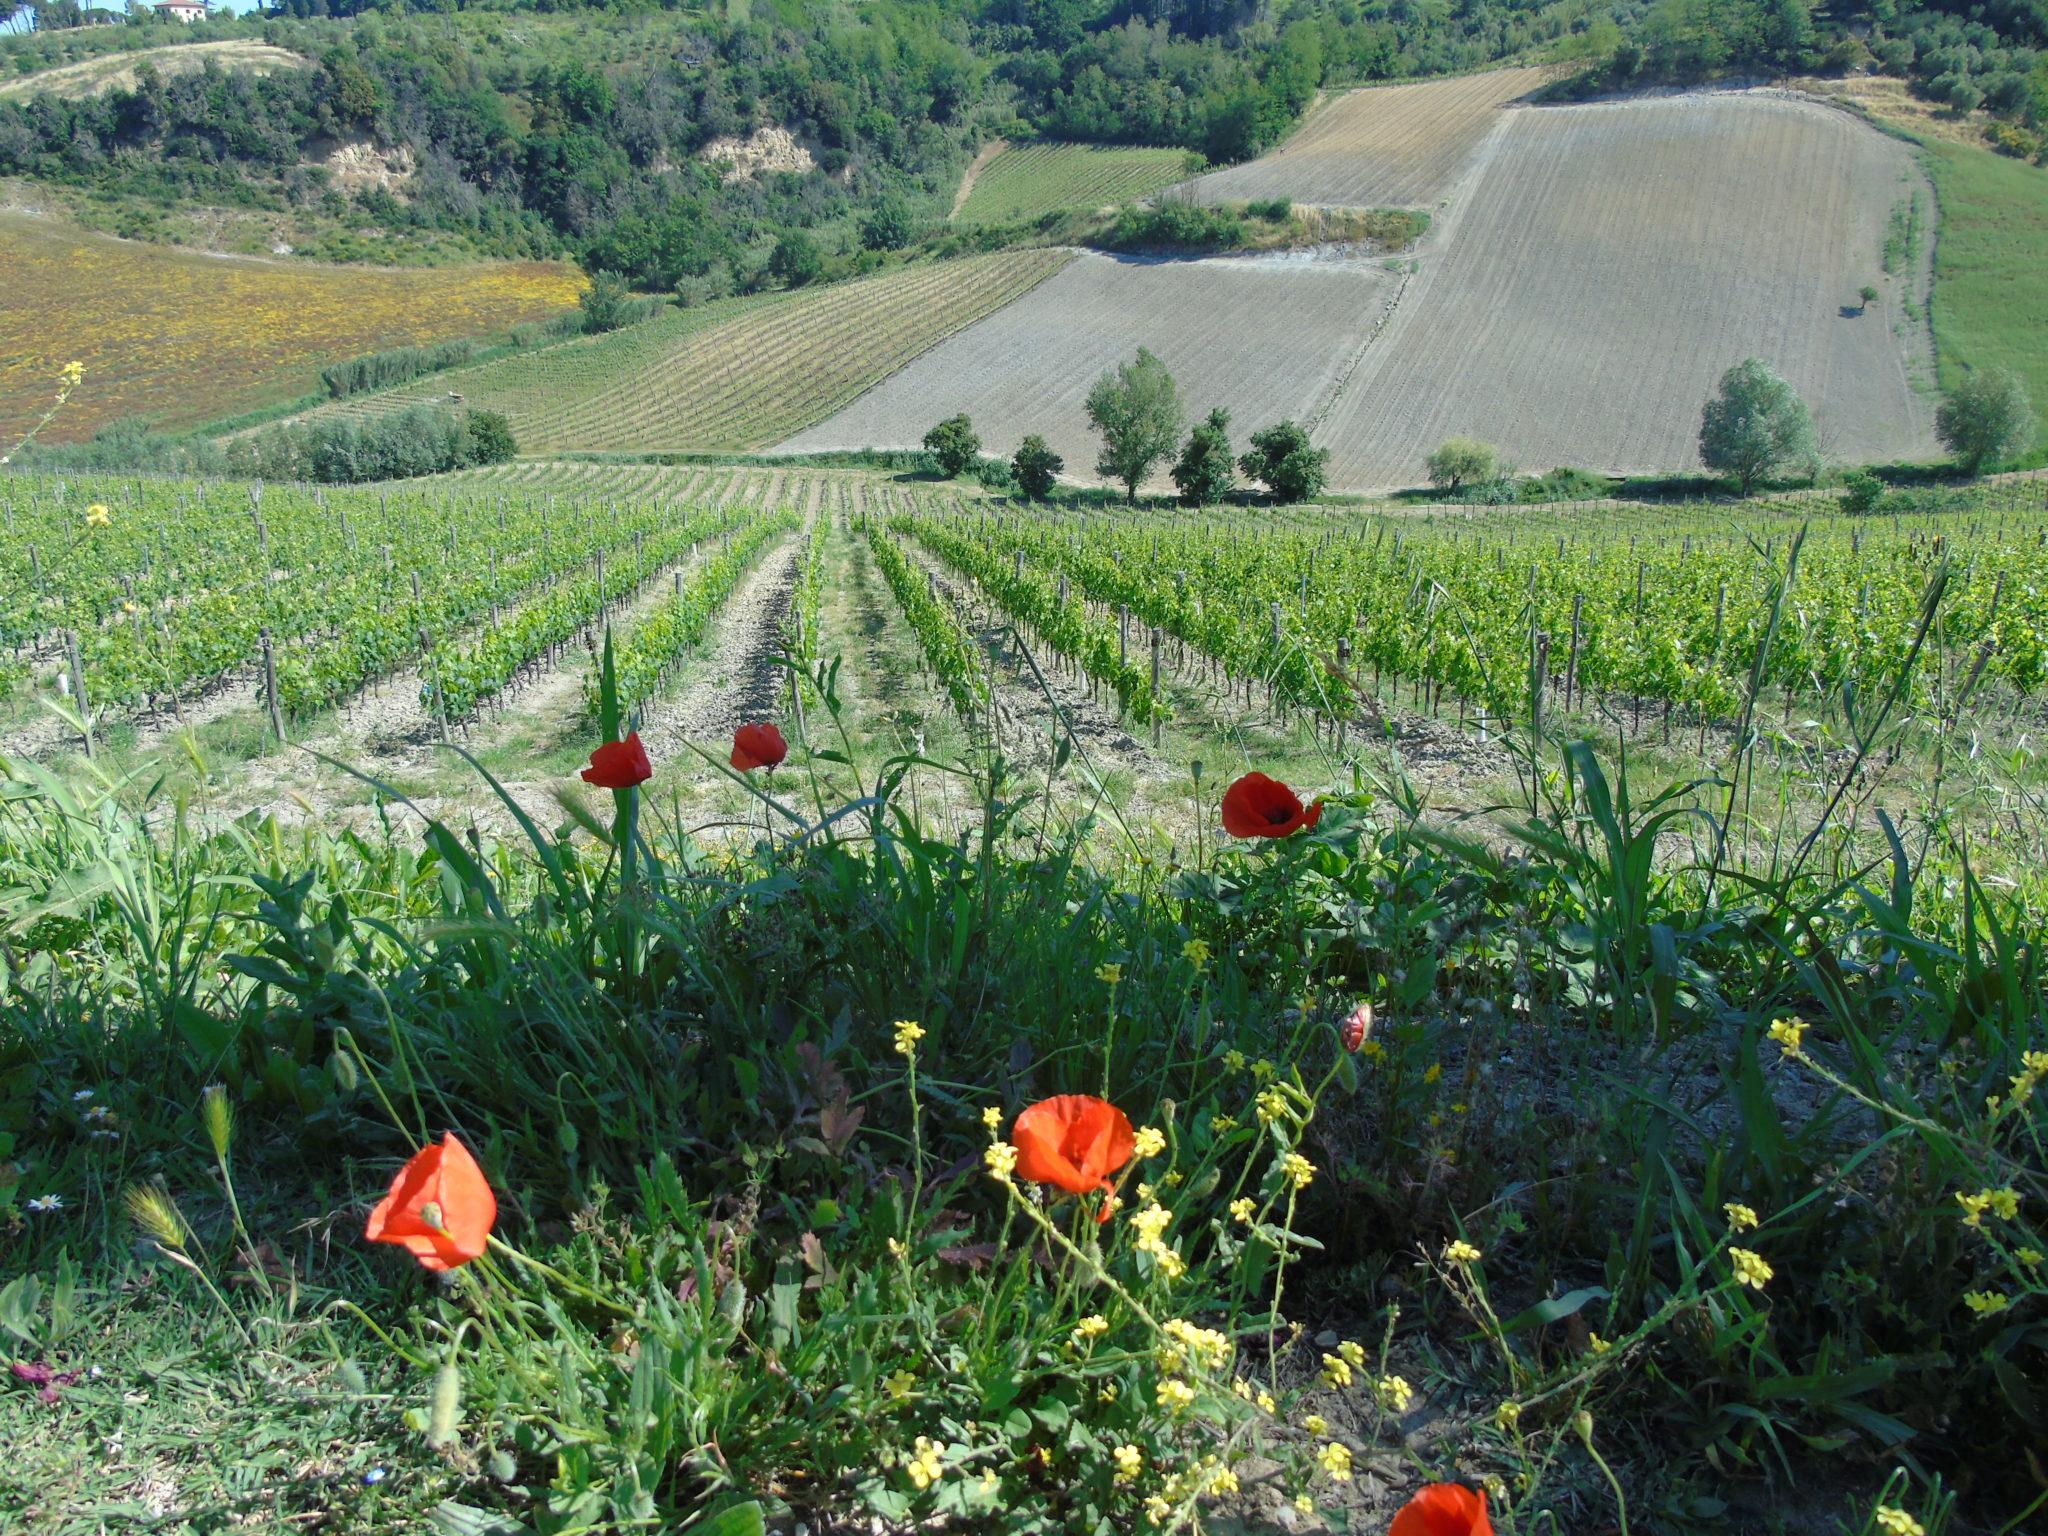 Sample wines of the region on a wine tasting tour